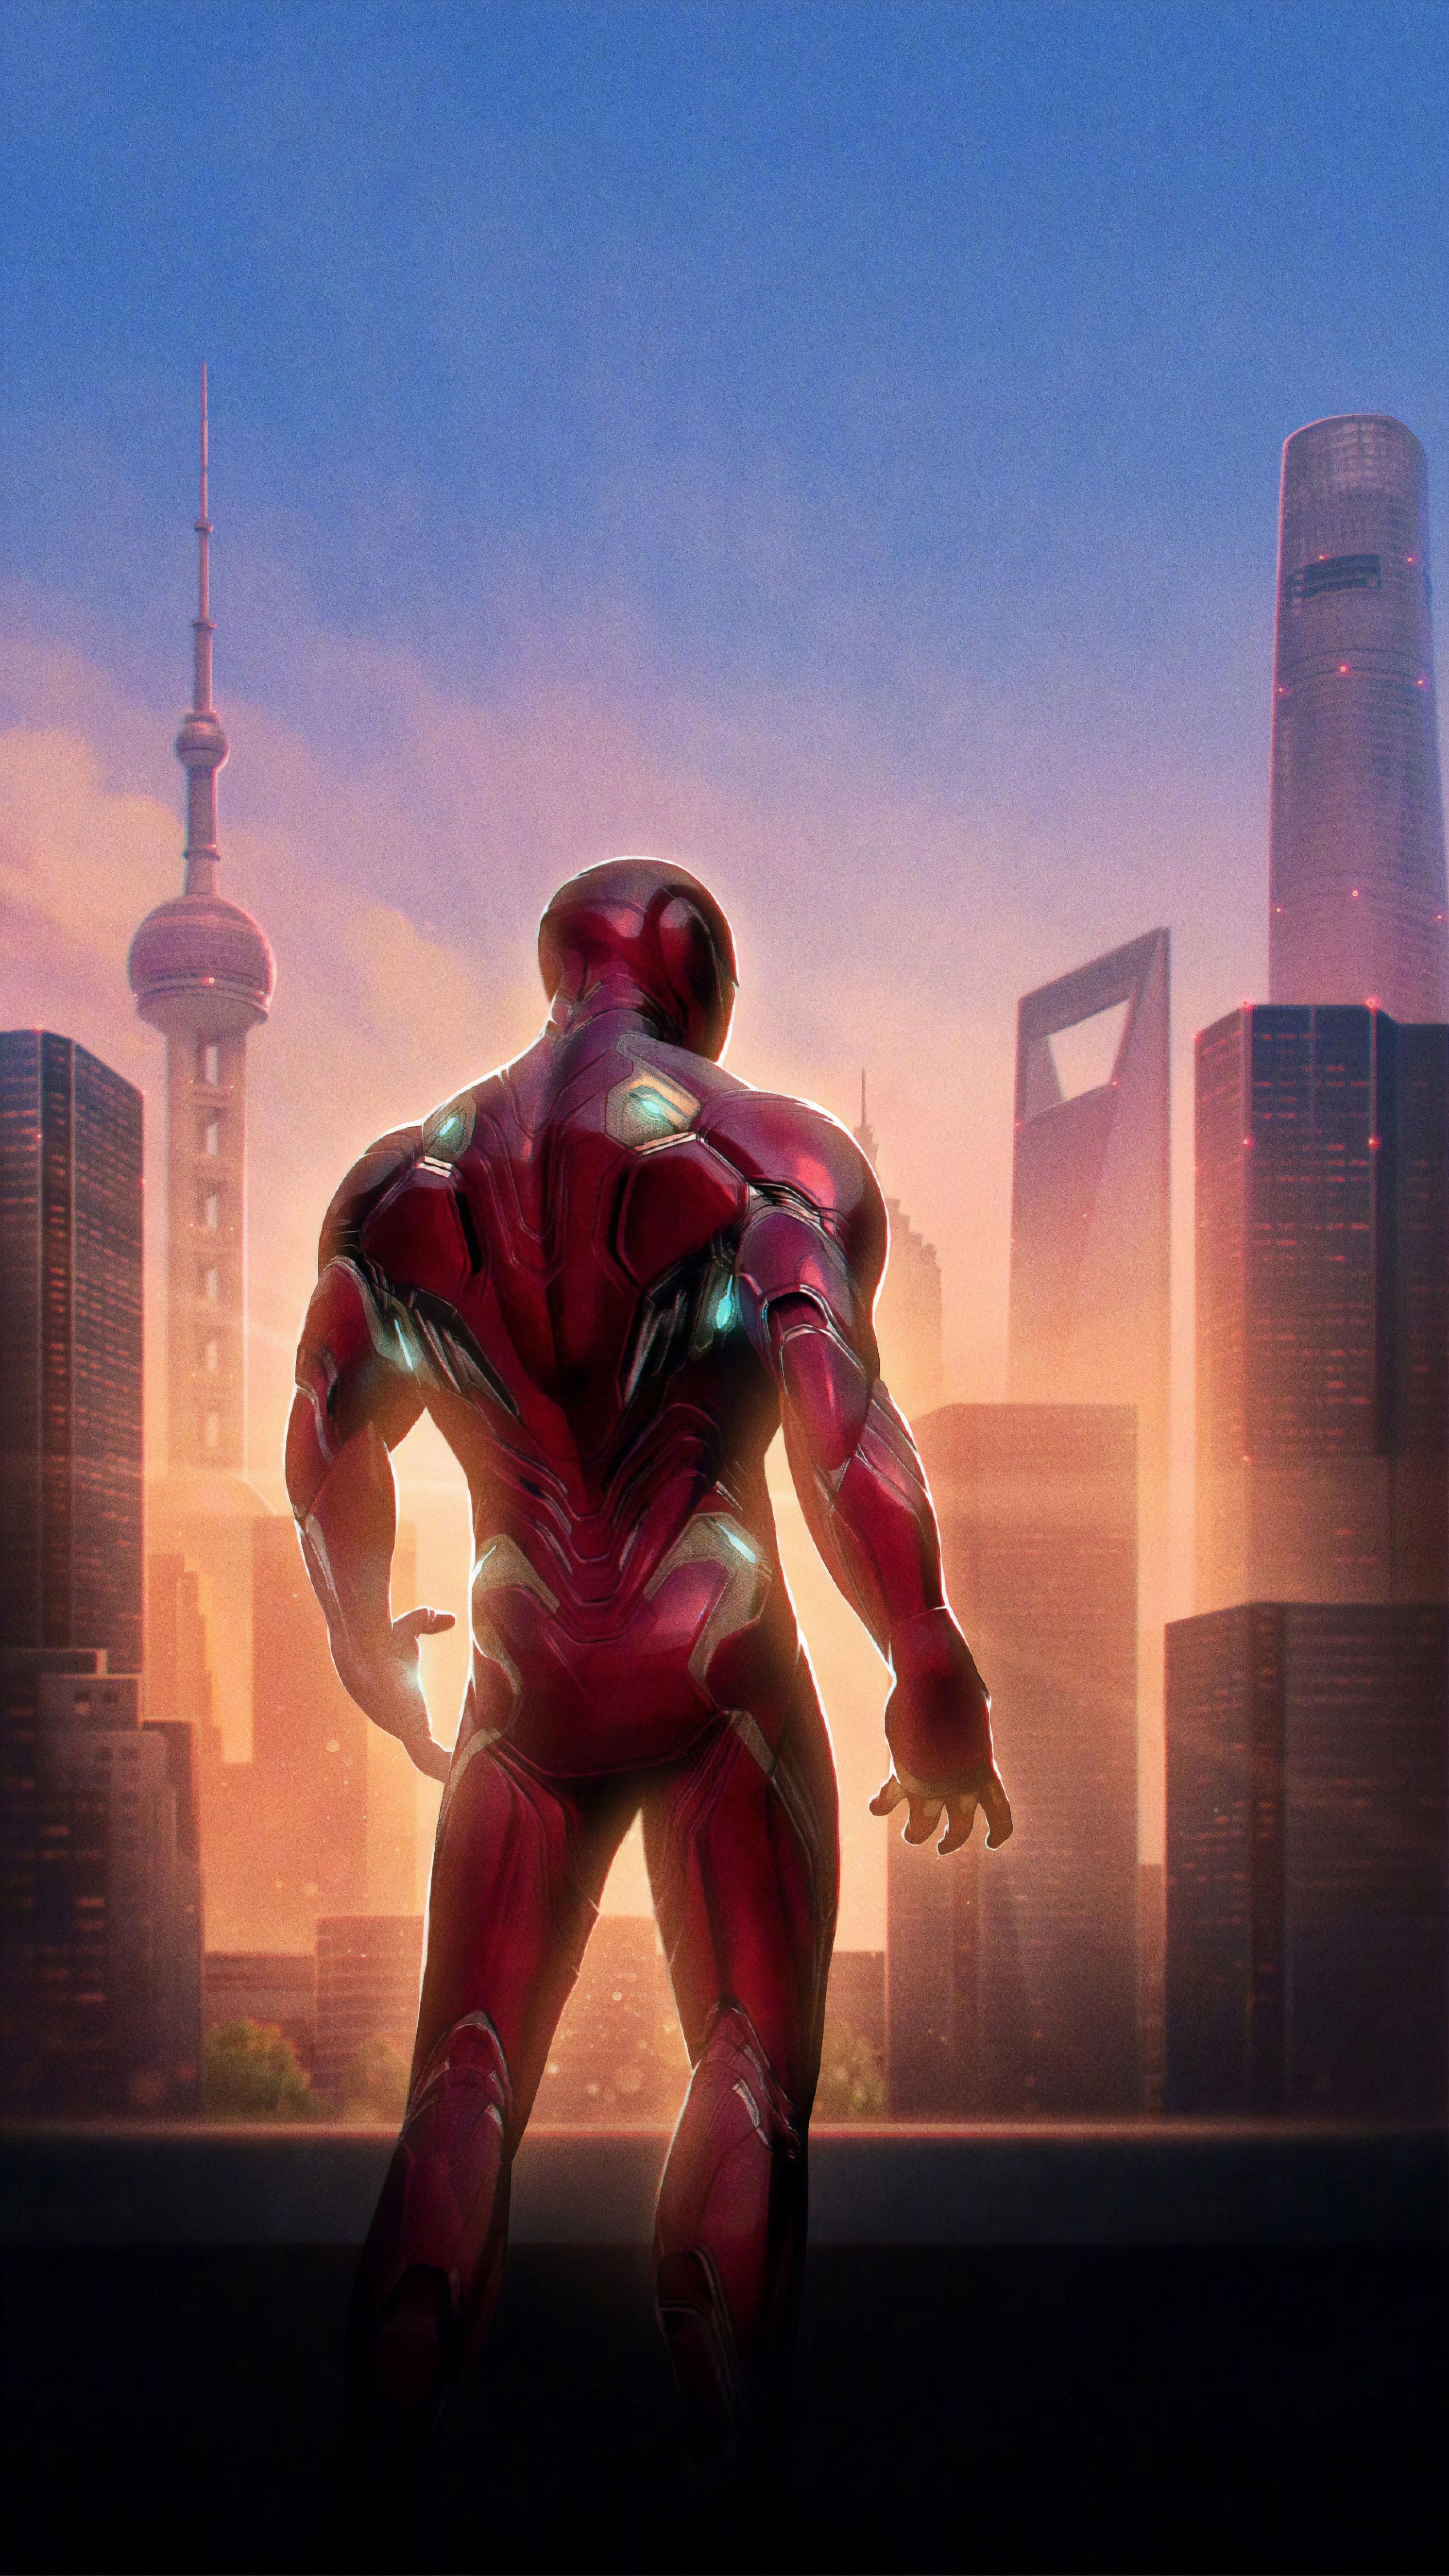 Iron Man Avengers Endgame Wallpaper, HD Movies 4K ...